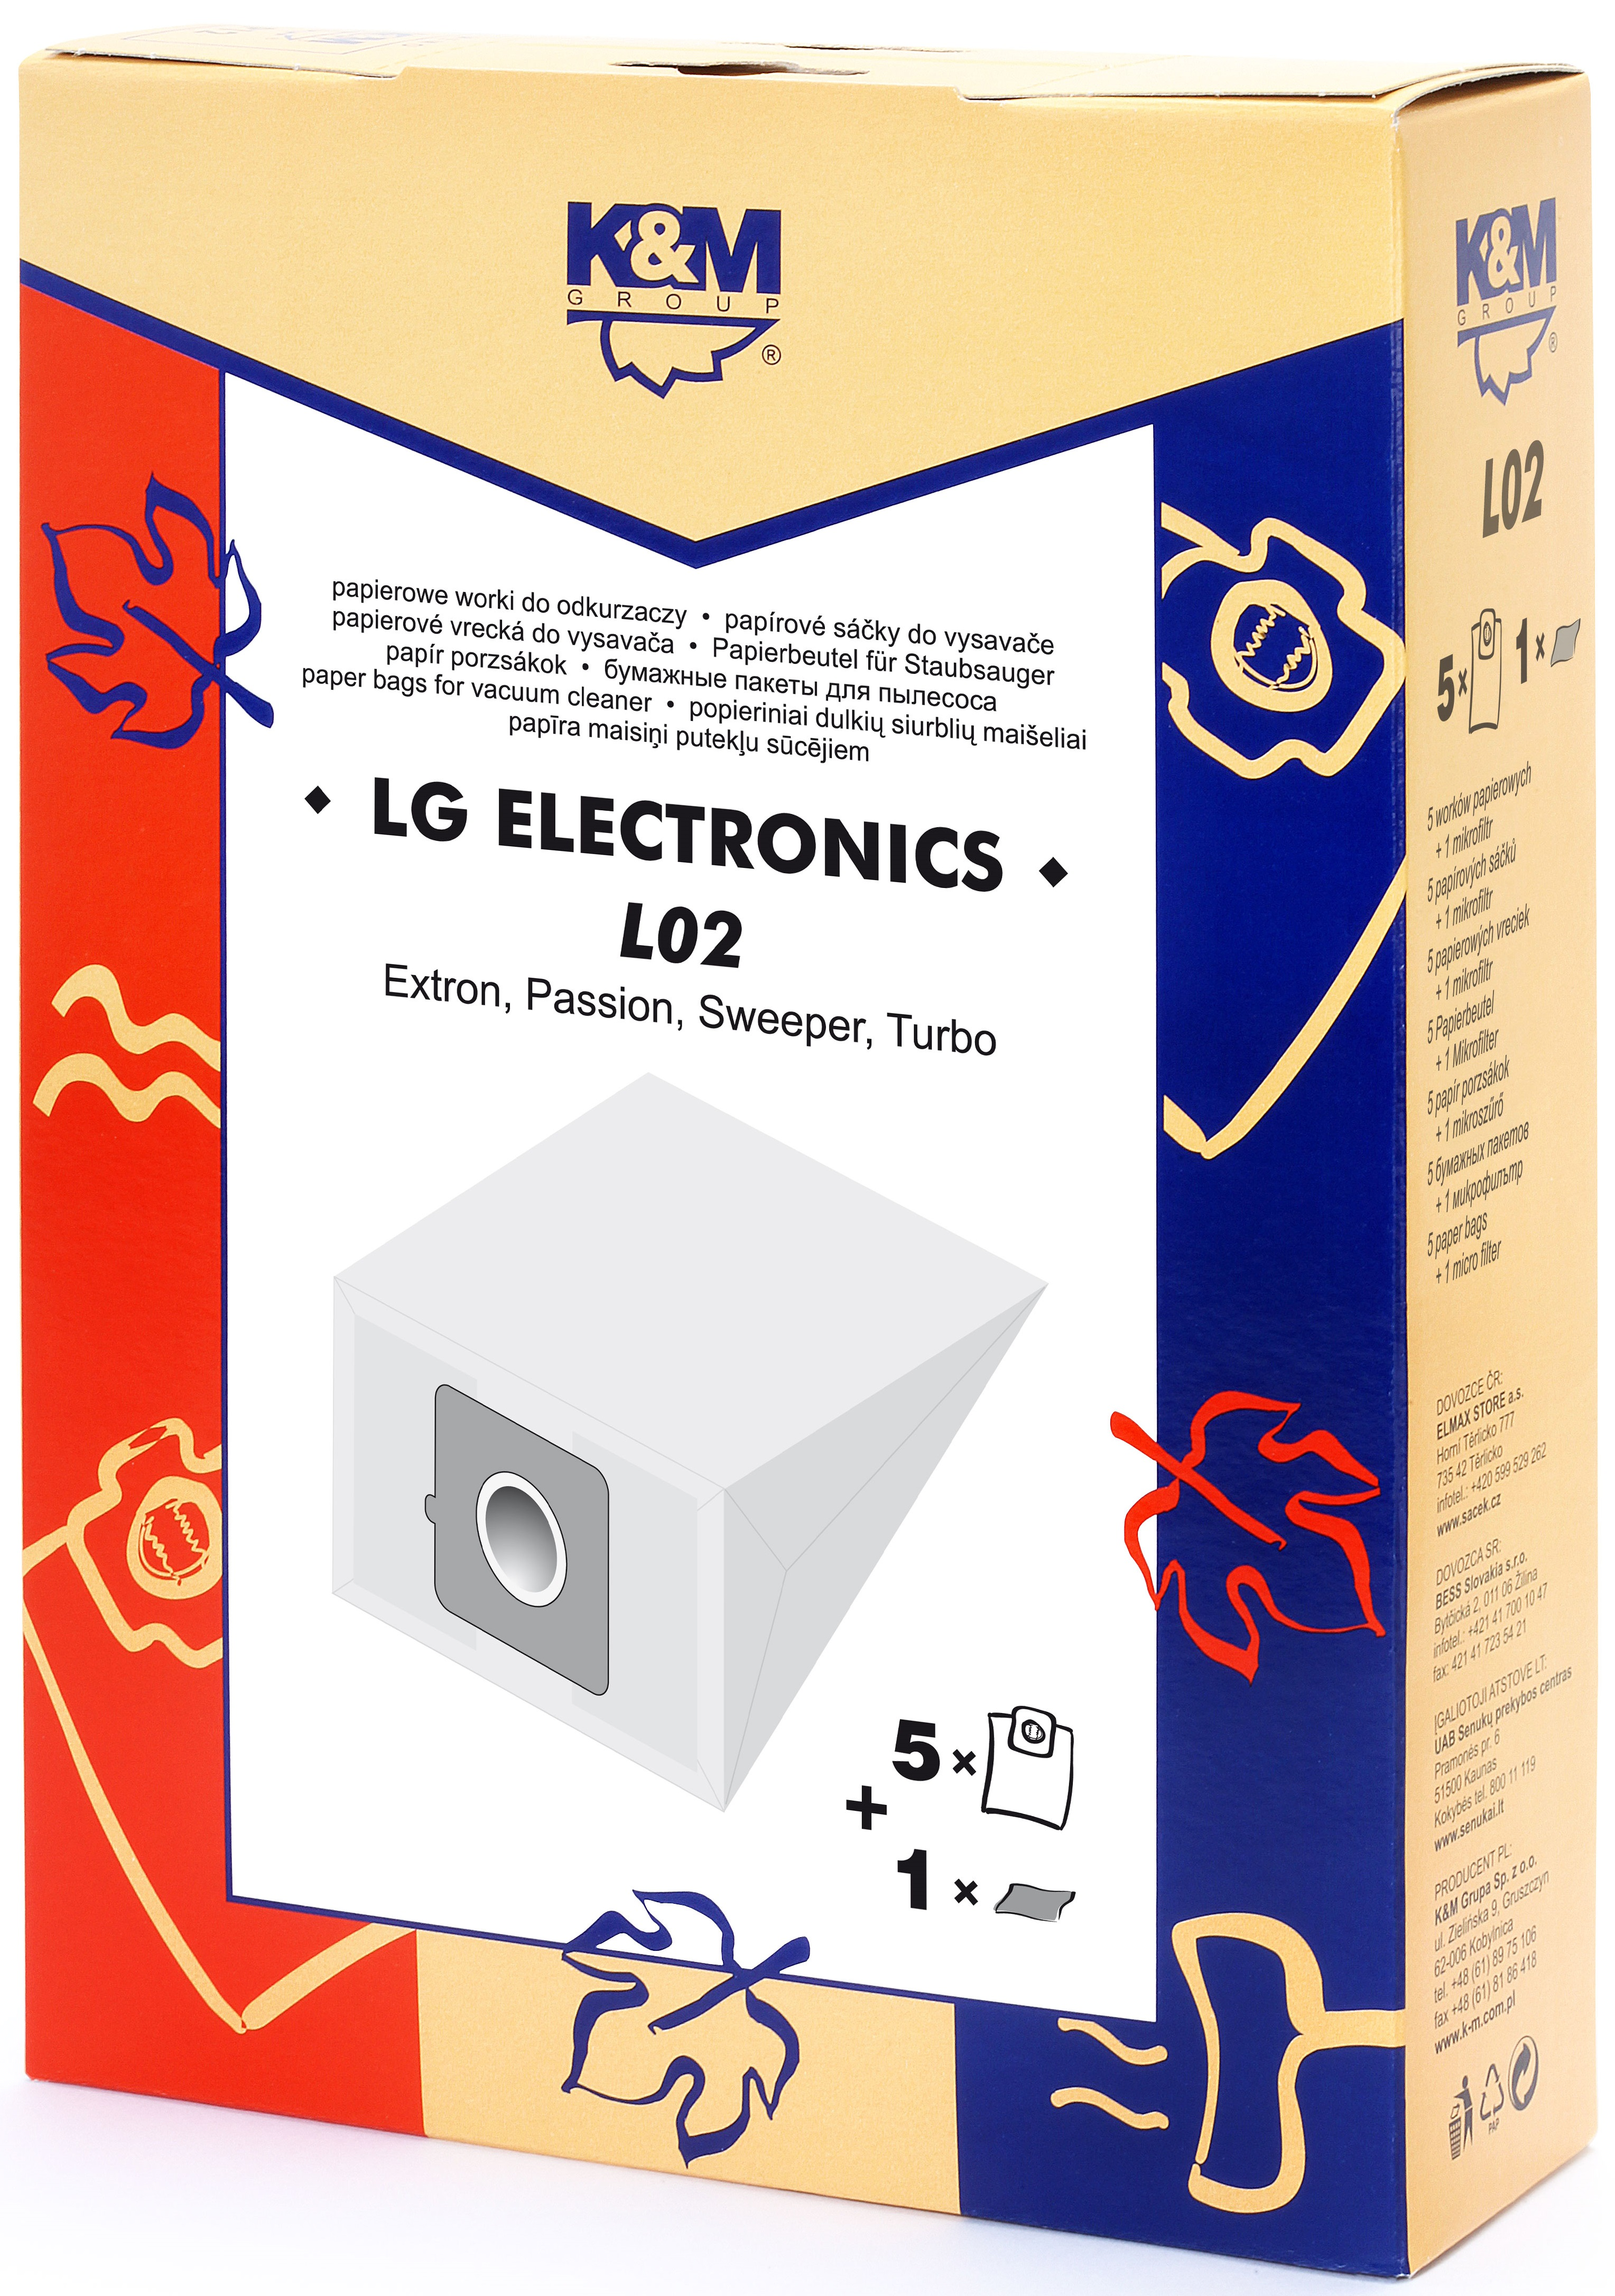 Sac aspirator LG TB-33, hartie, 5X saci + 1 filtru, K&M [0]